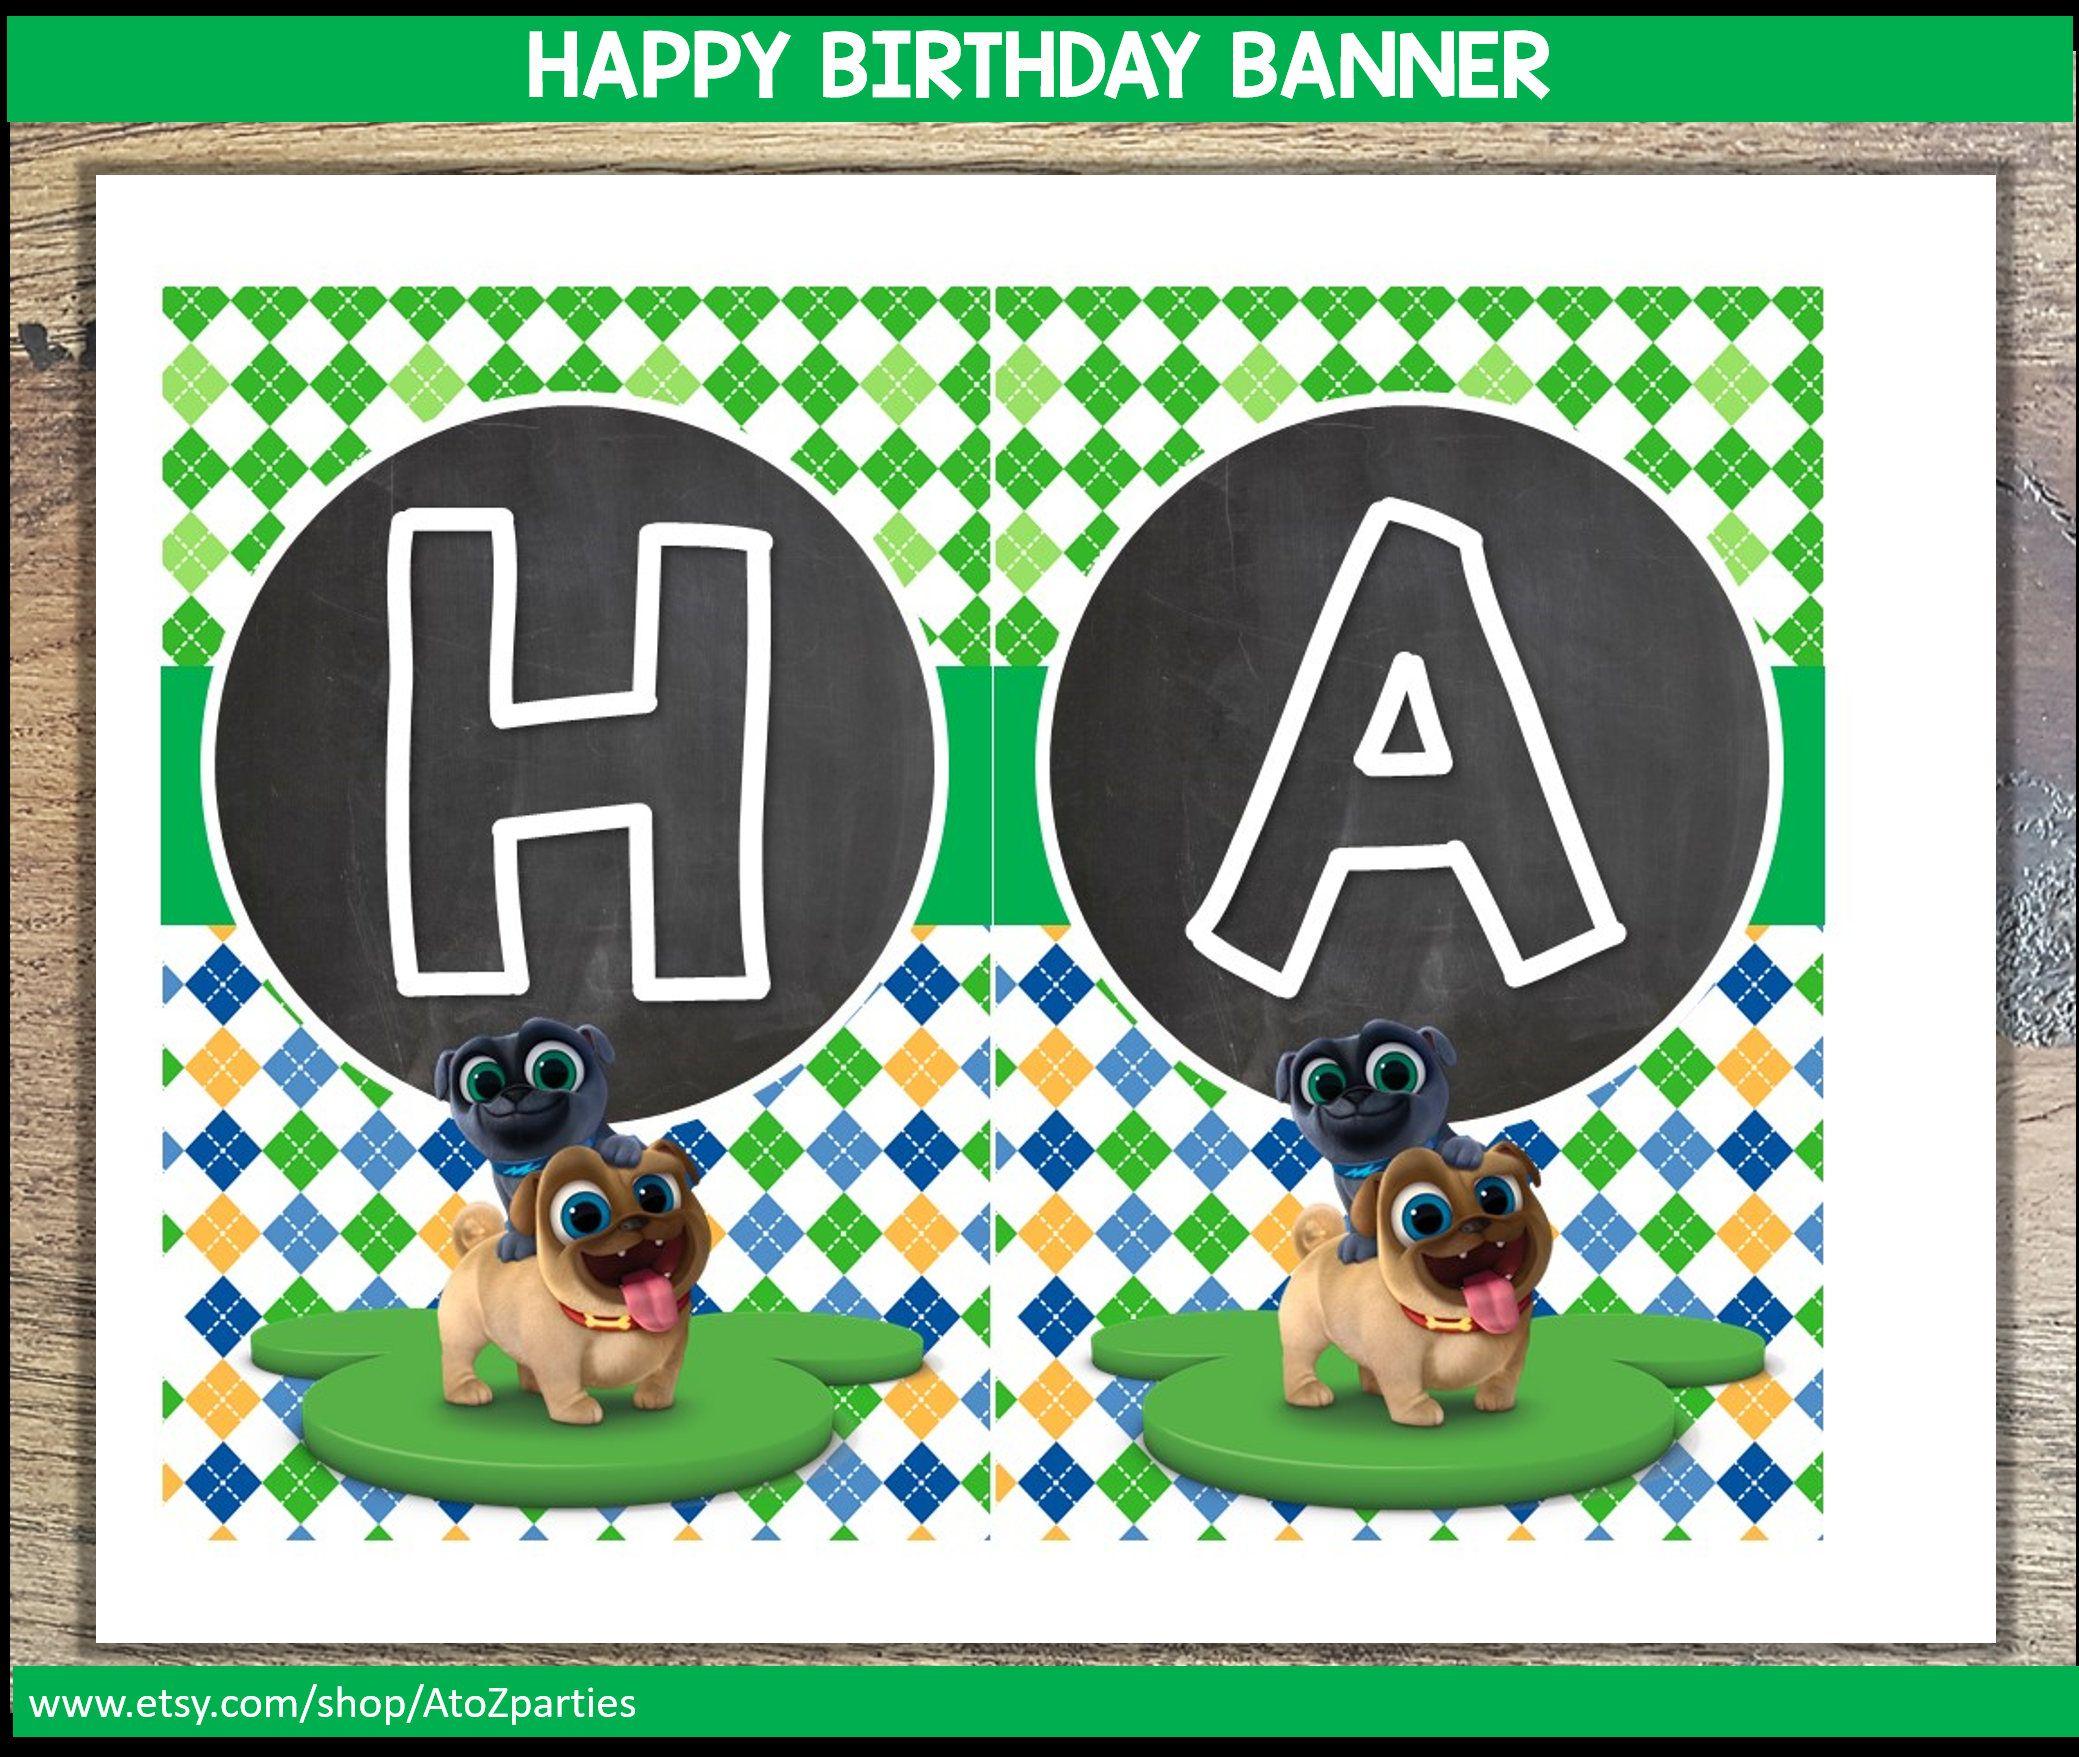 Puppy Dog Pals Happy Birthday Banner Green And Chalkboard Puppy Dog Pals Decor Instant Download U Happy Birthday Banners Birthday Banner Dogs And Puppies